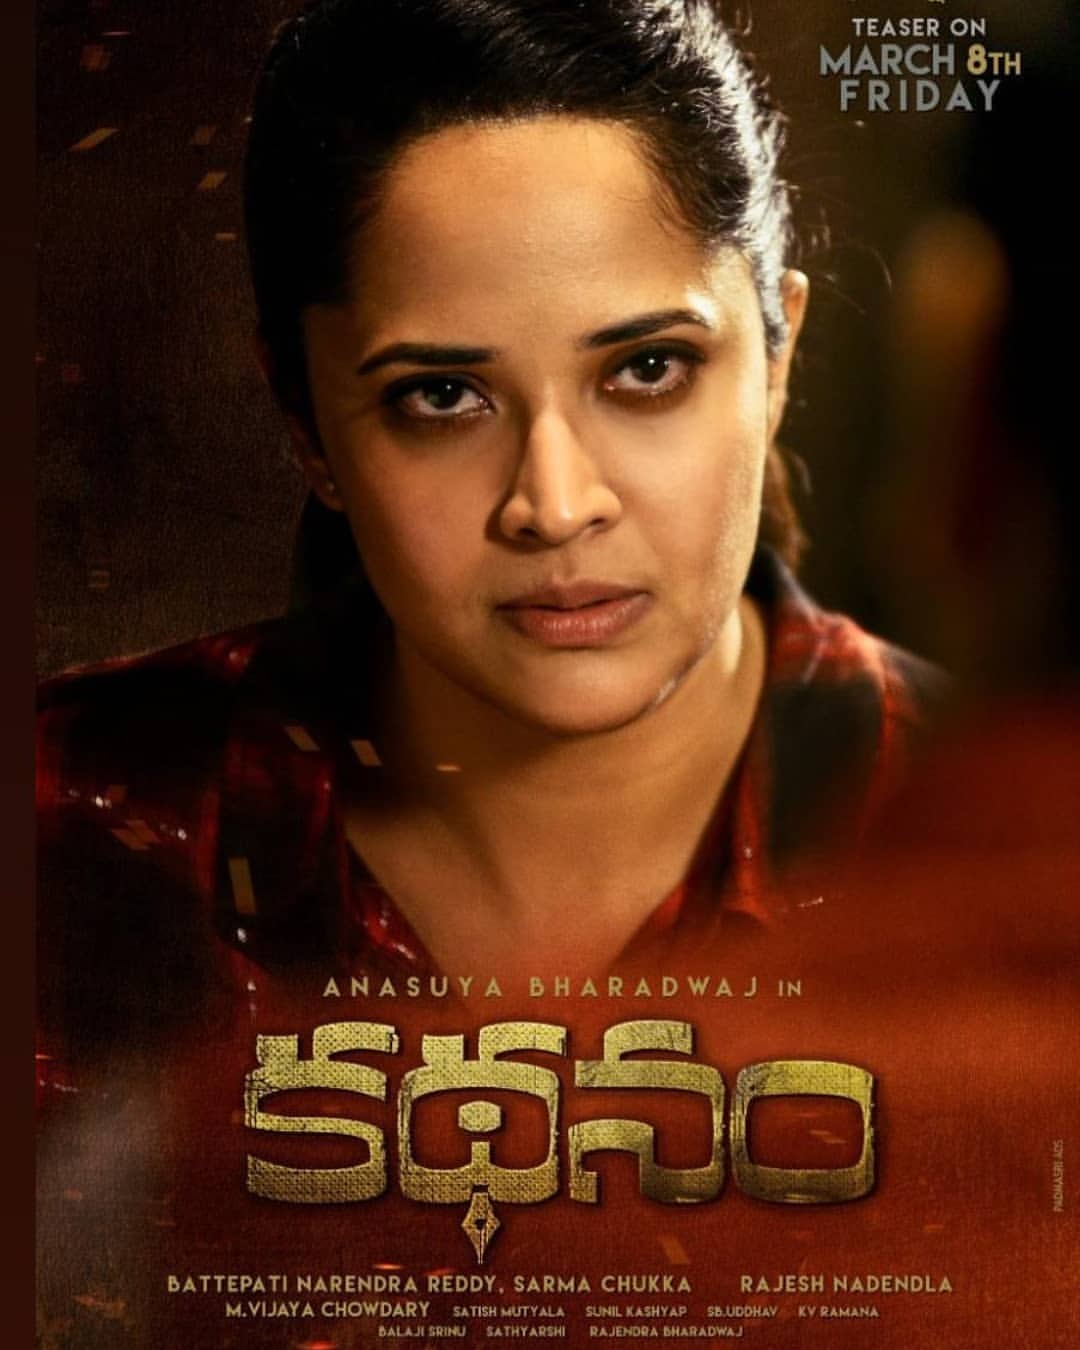 Tenali Ramakrishna BABL TamilRockers Full Movie [New